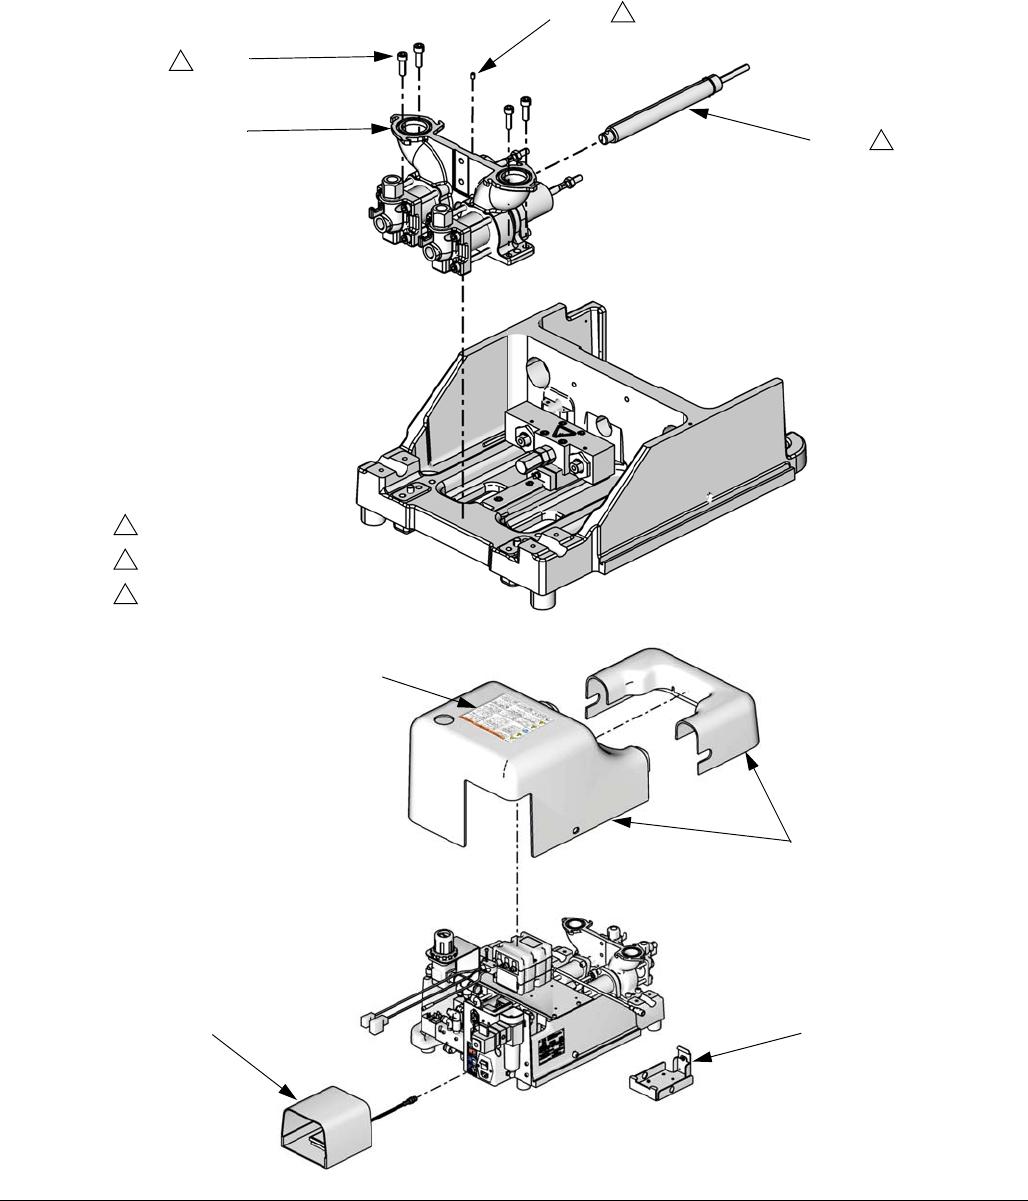 Graco 312760s pr70 and pr70v users manual pr70v repair parts english